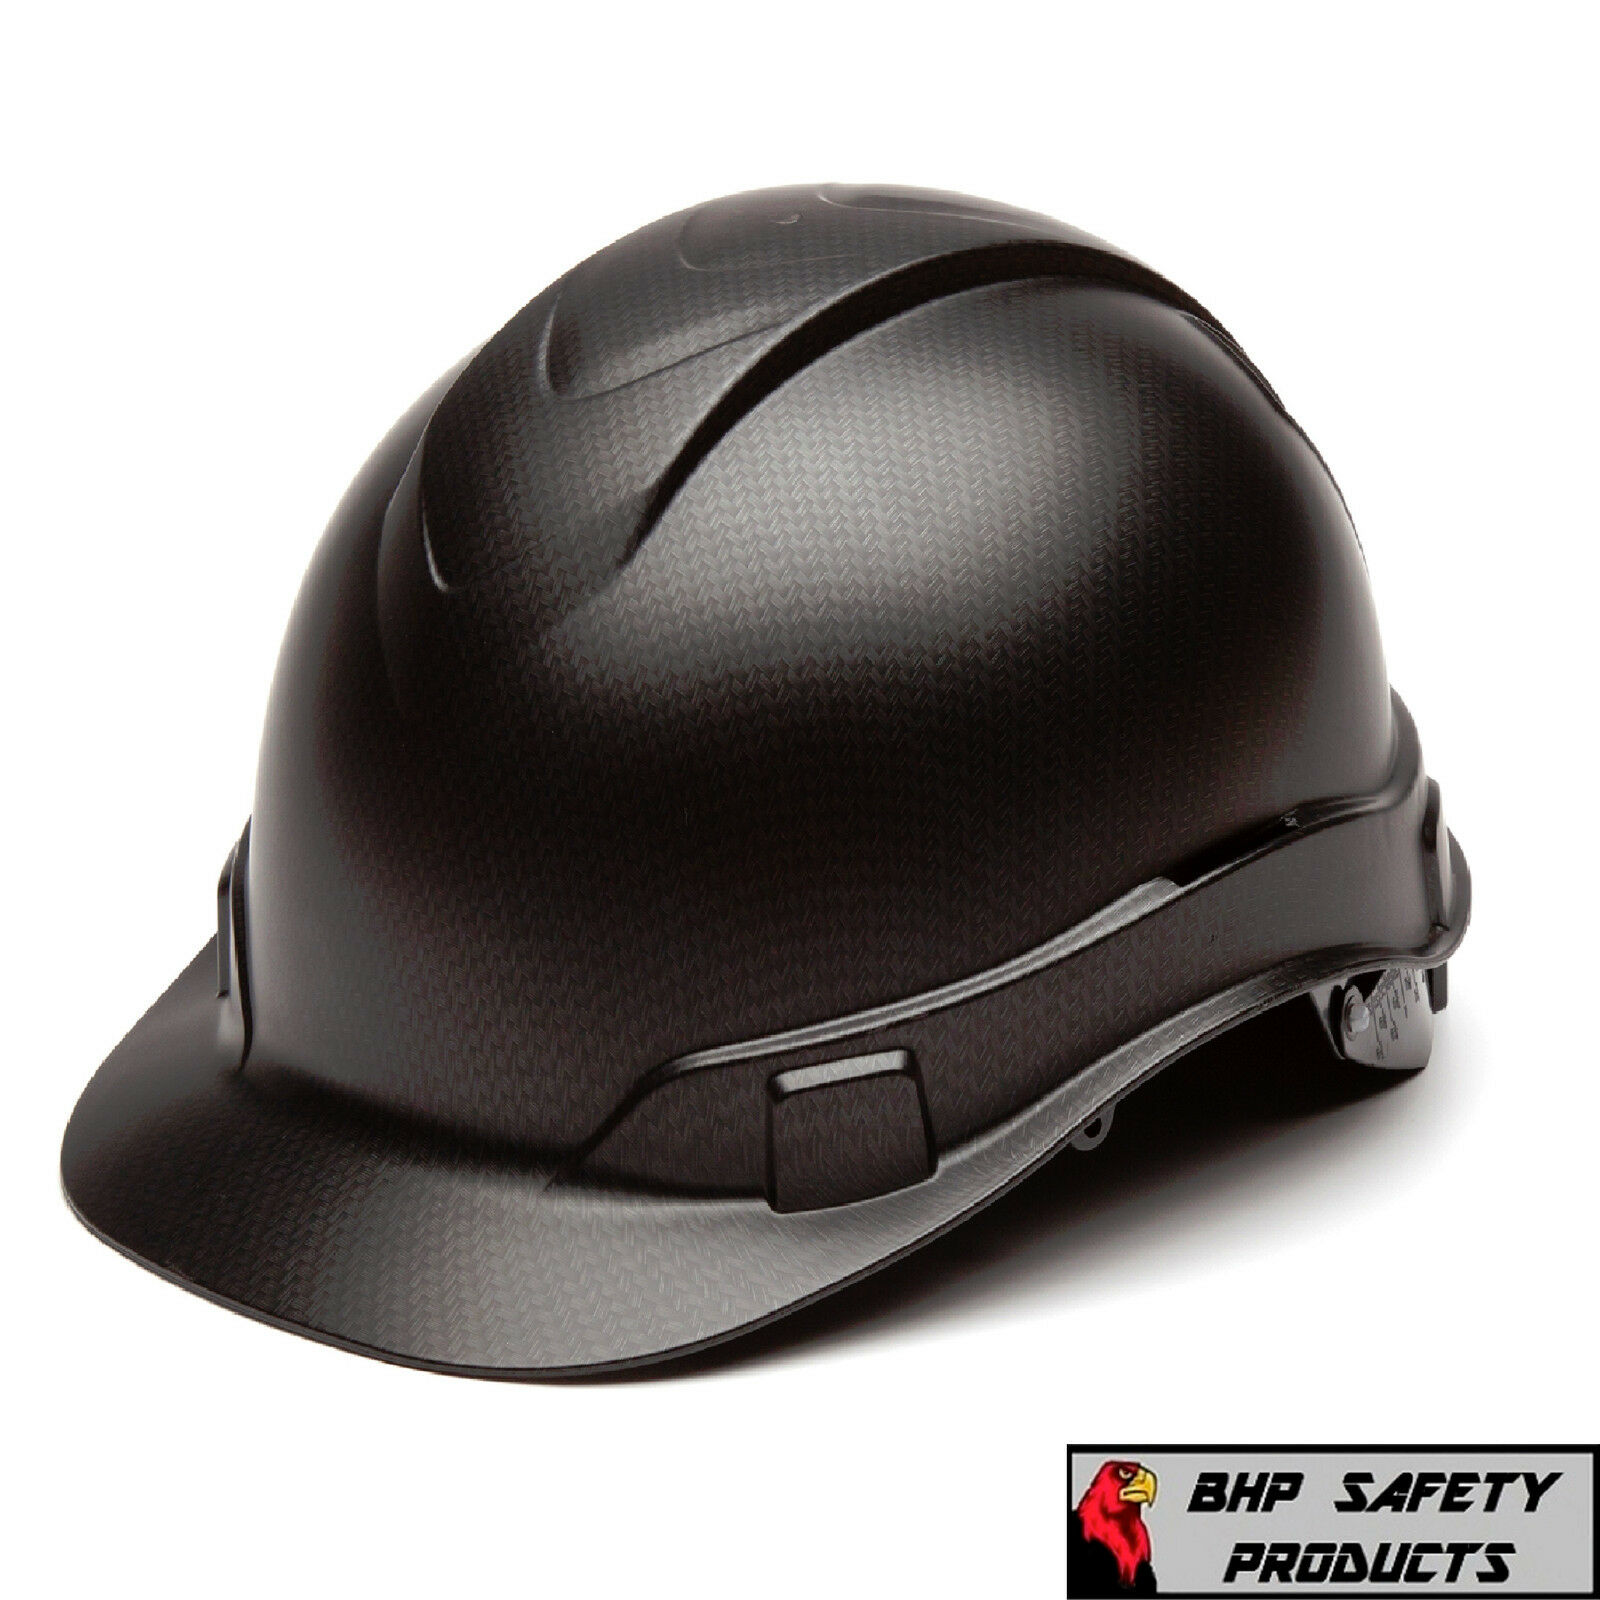 PYRAMEX RIDGELINE HARD HAT GRAPHITE PATTERN BLACK CAP STYLE CONSTRUCTION HP44117